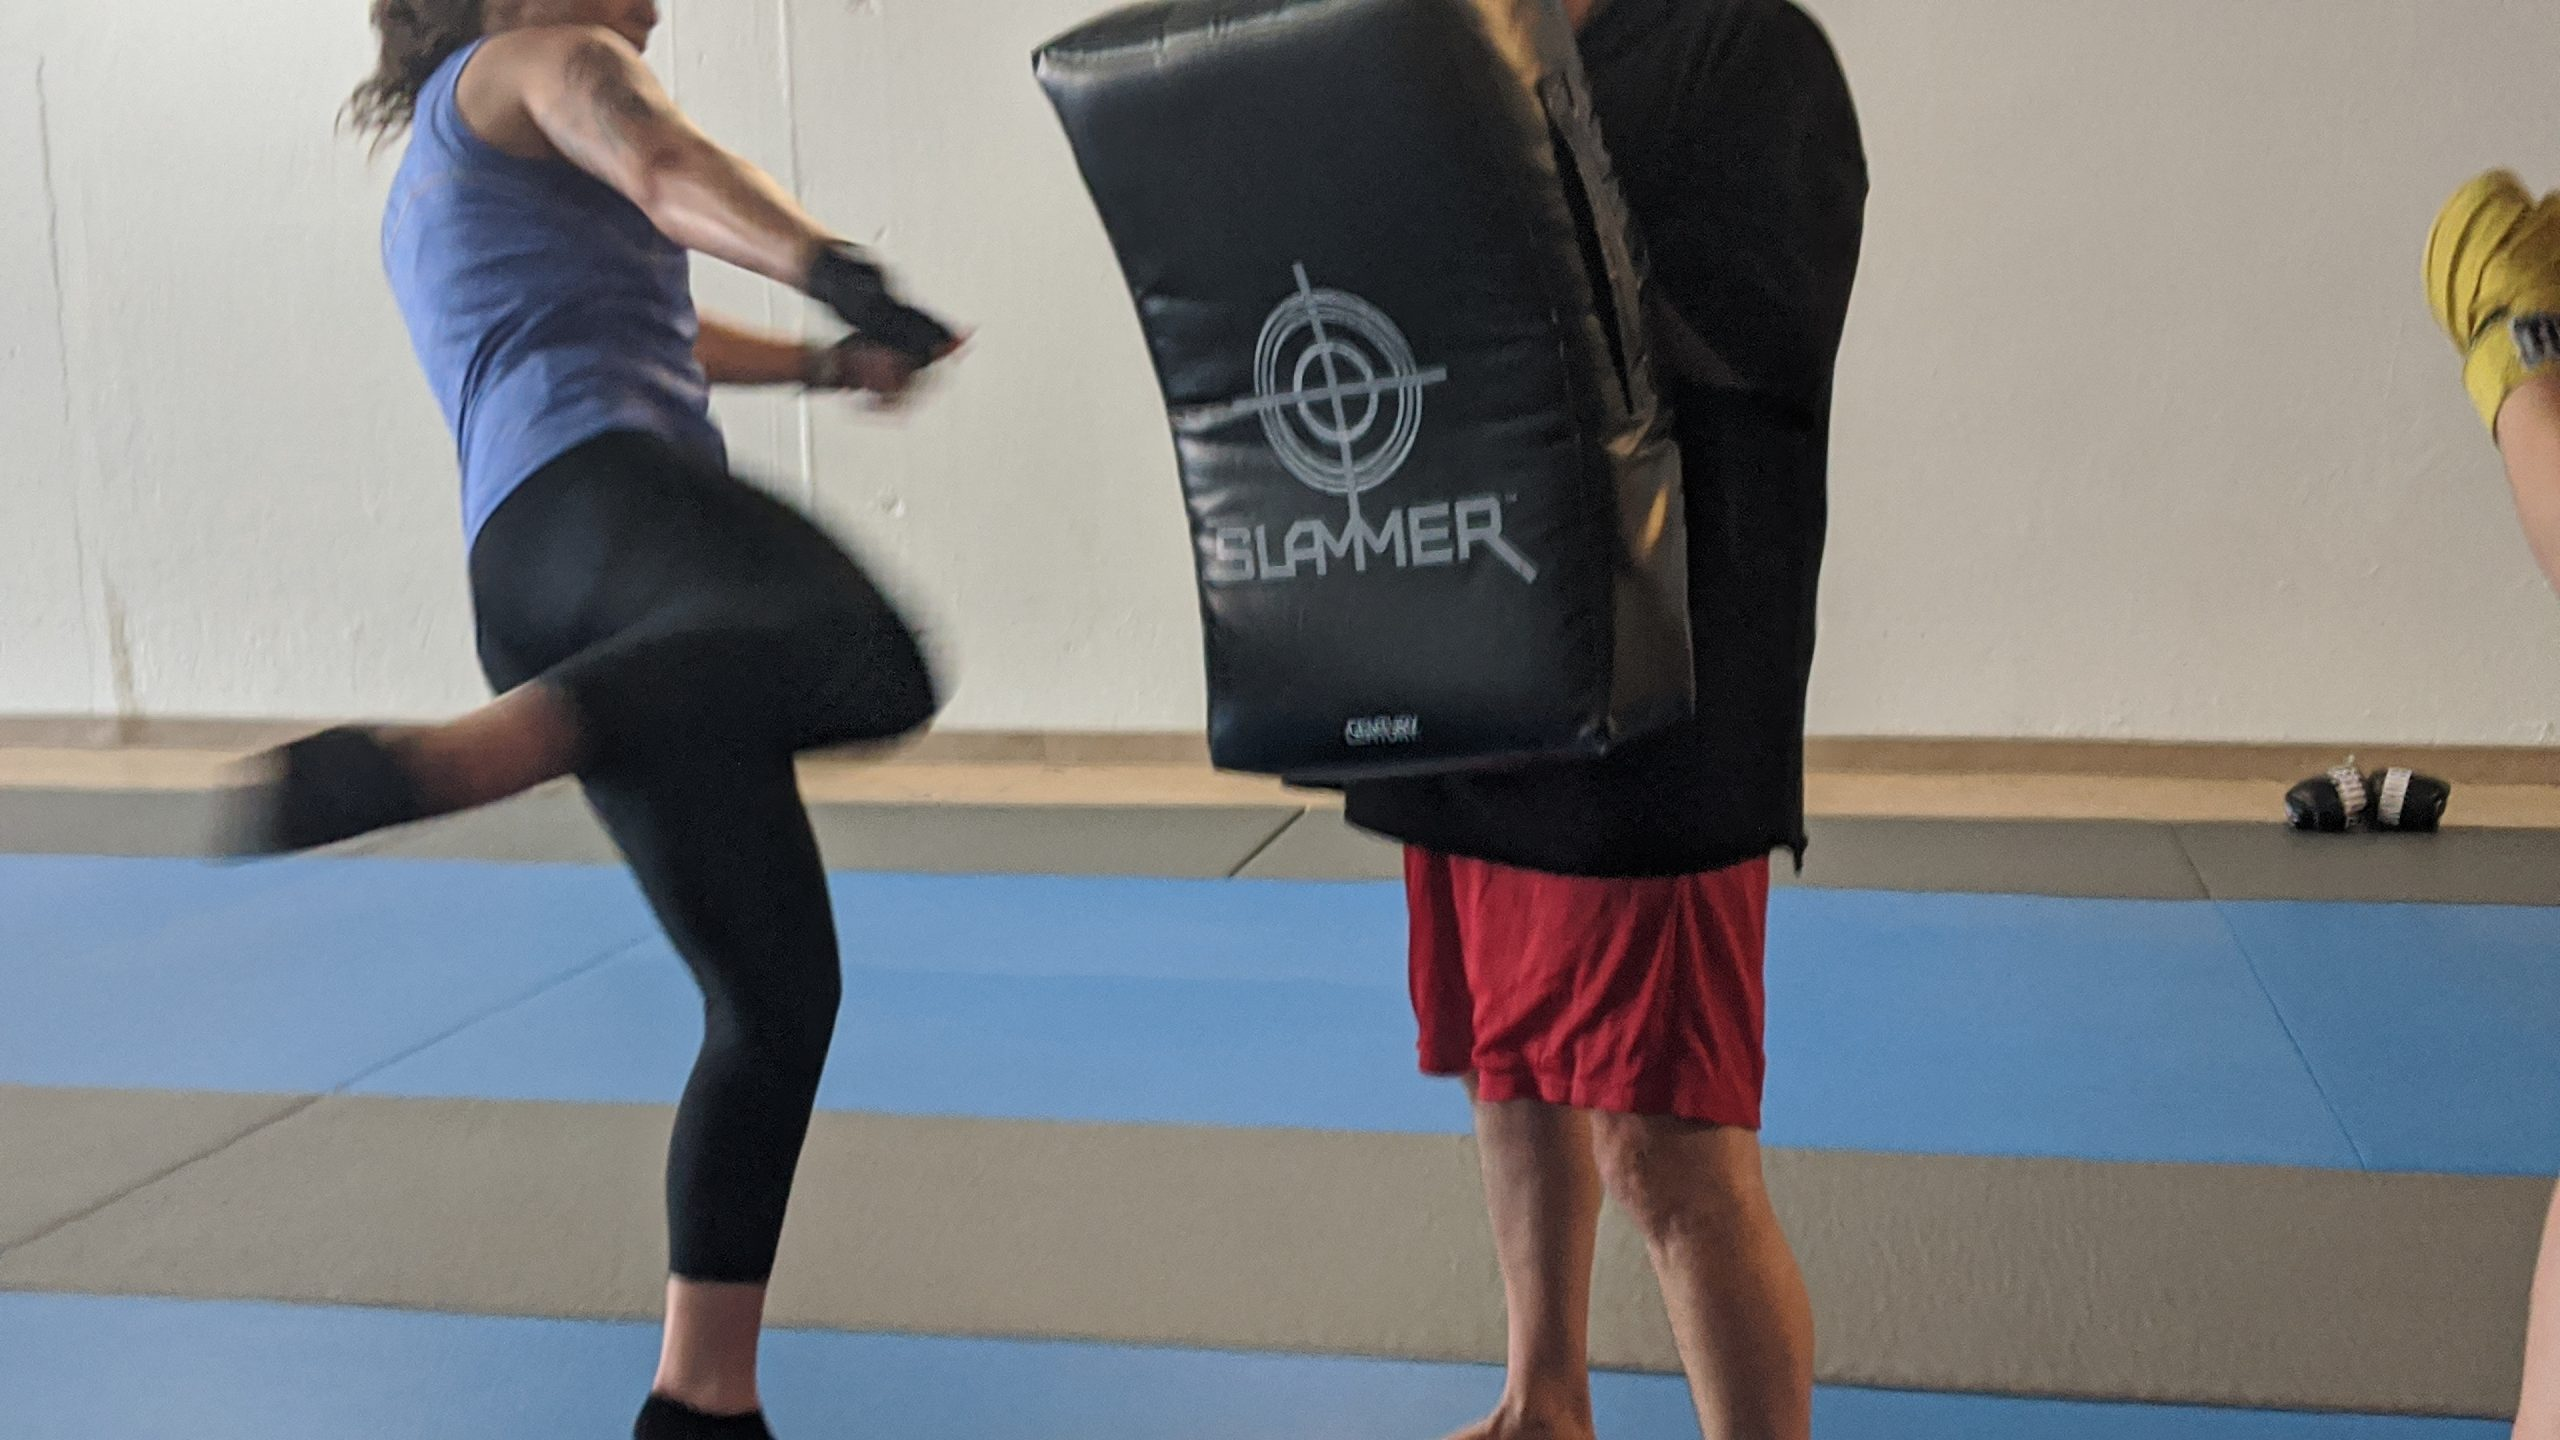 girl kicking a muay thai pad